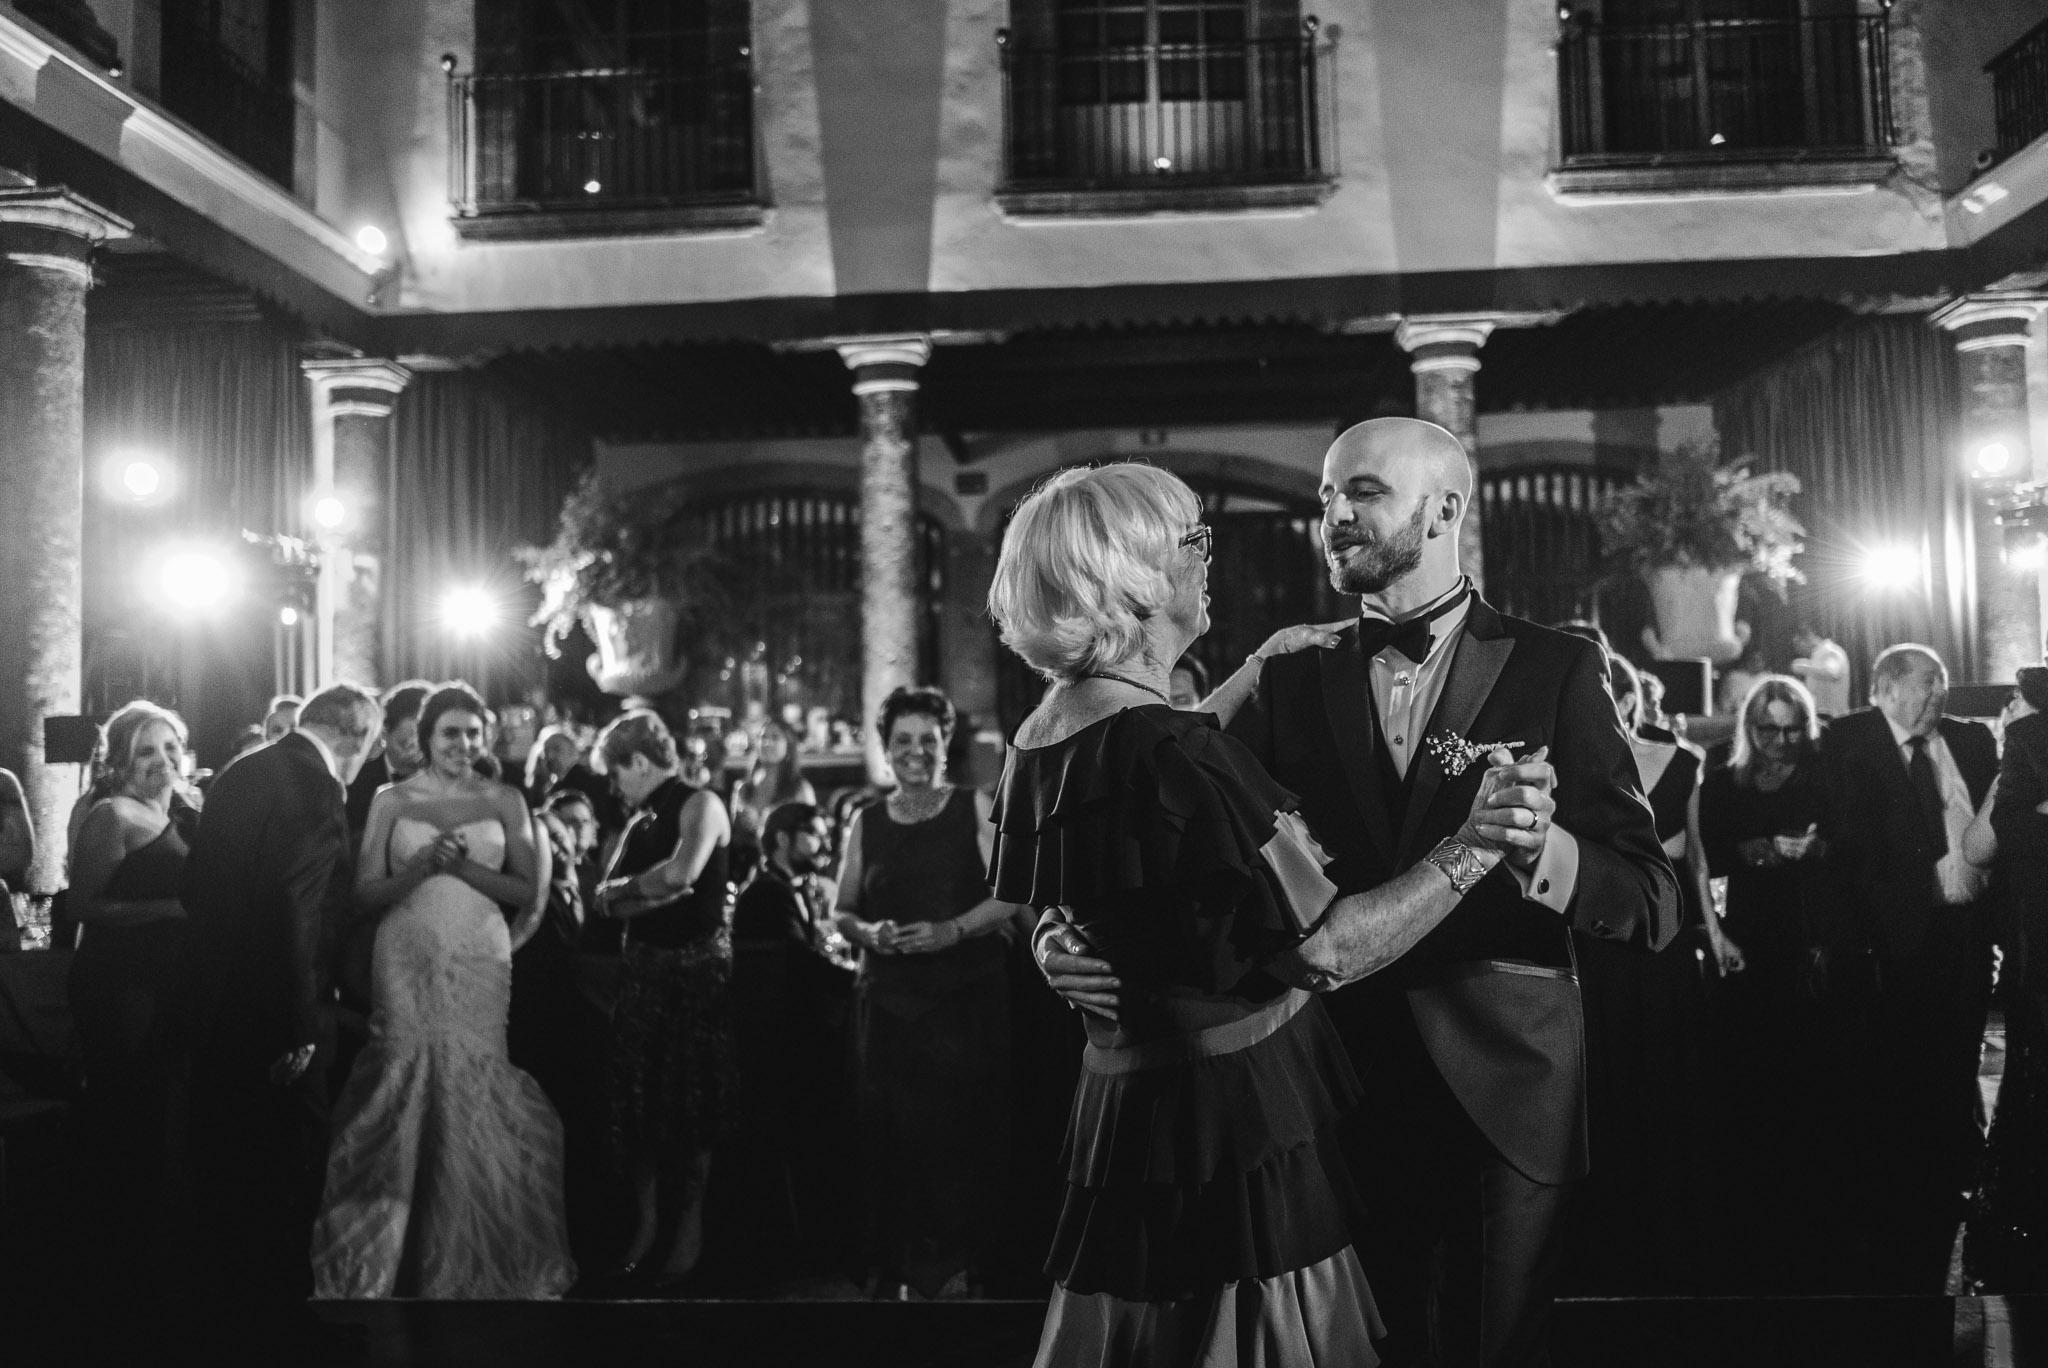 ©www.mauriziosolisbroca.com-20161002maurizio-solis-broca-mexico-canada-wedding-photographer20161002DSC05544-Edit.jpg